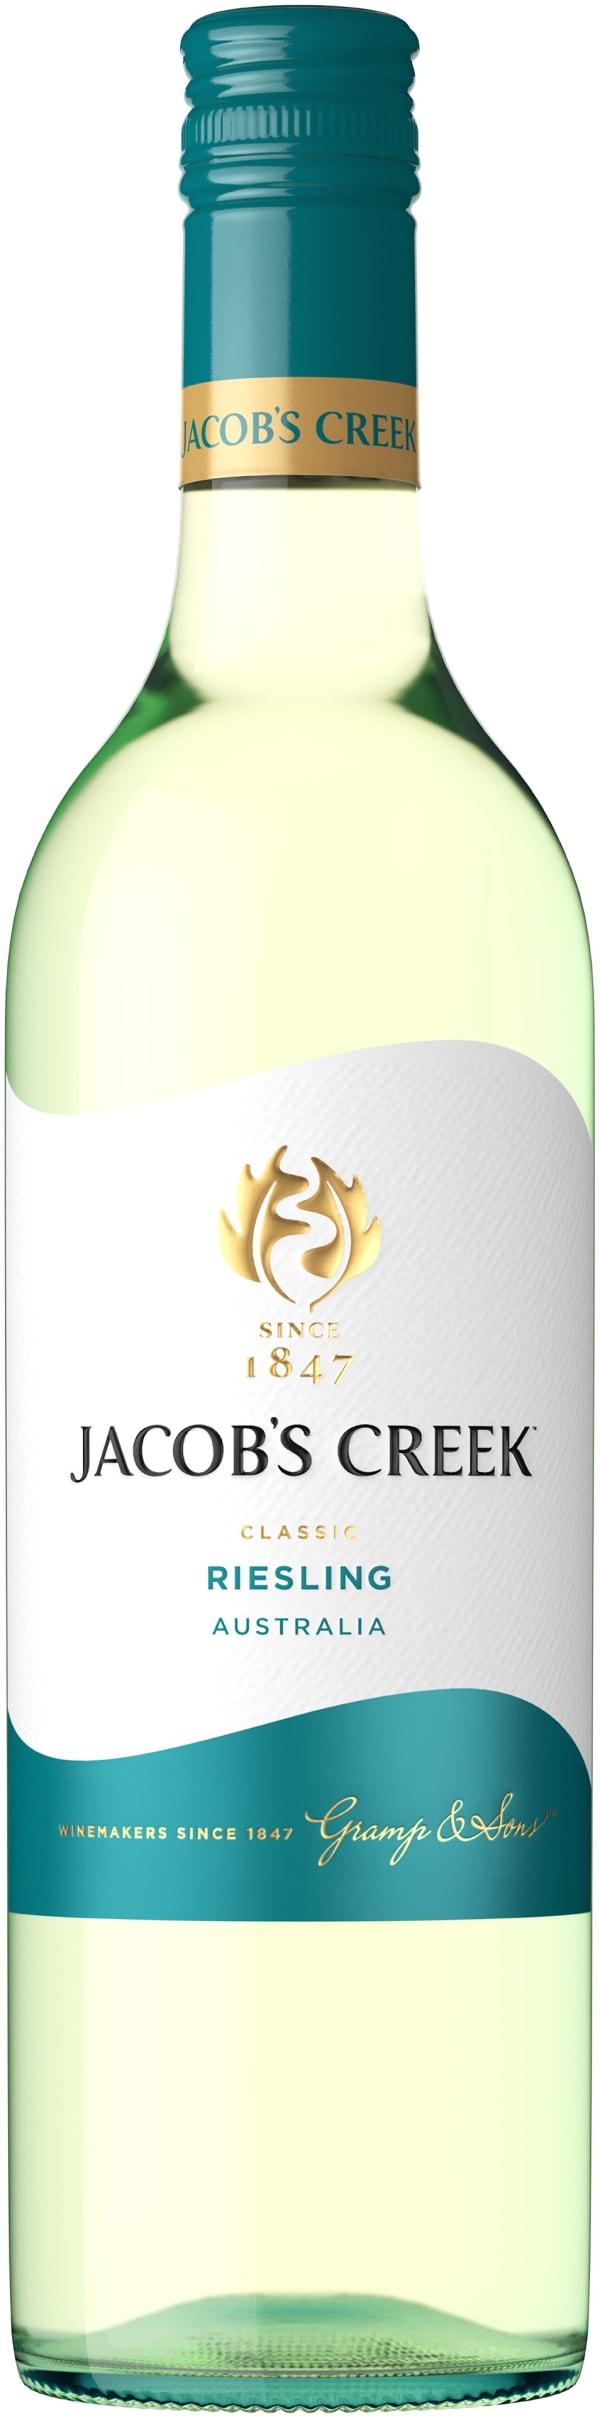 Jacob's Creek Riesling 2017